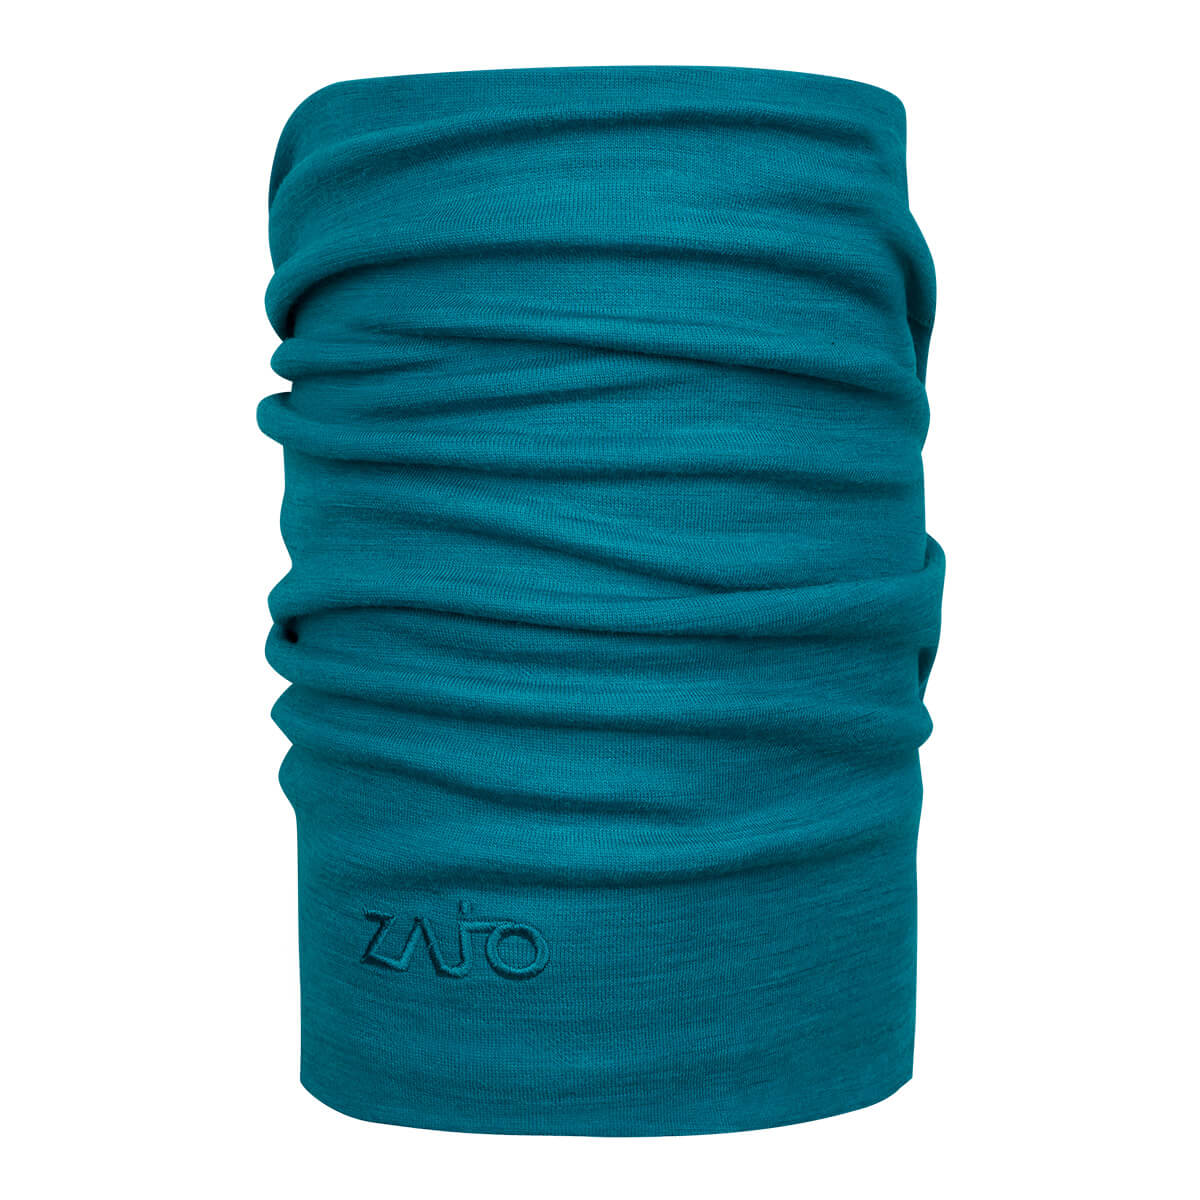 ZAJO Hals Unitube Enamel Blue Multifunkčná šatka z merino vlny